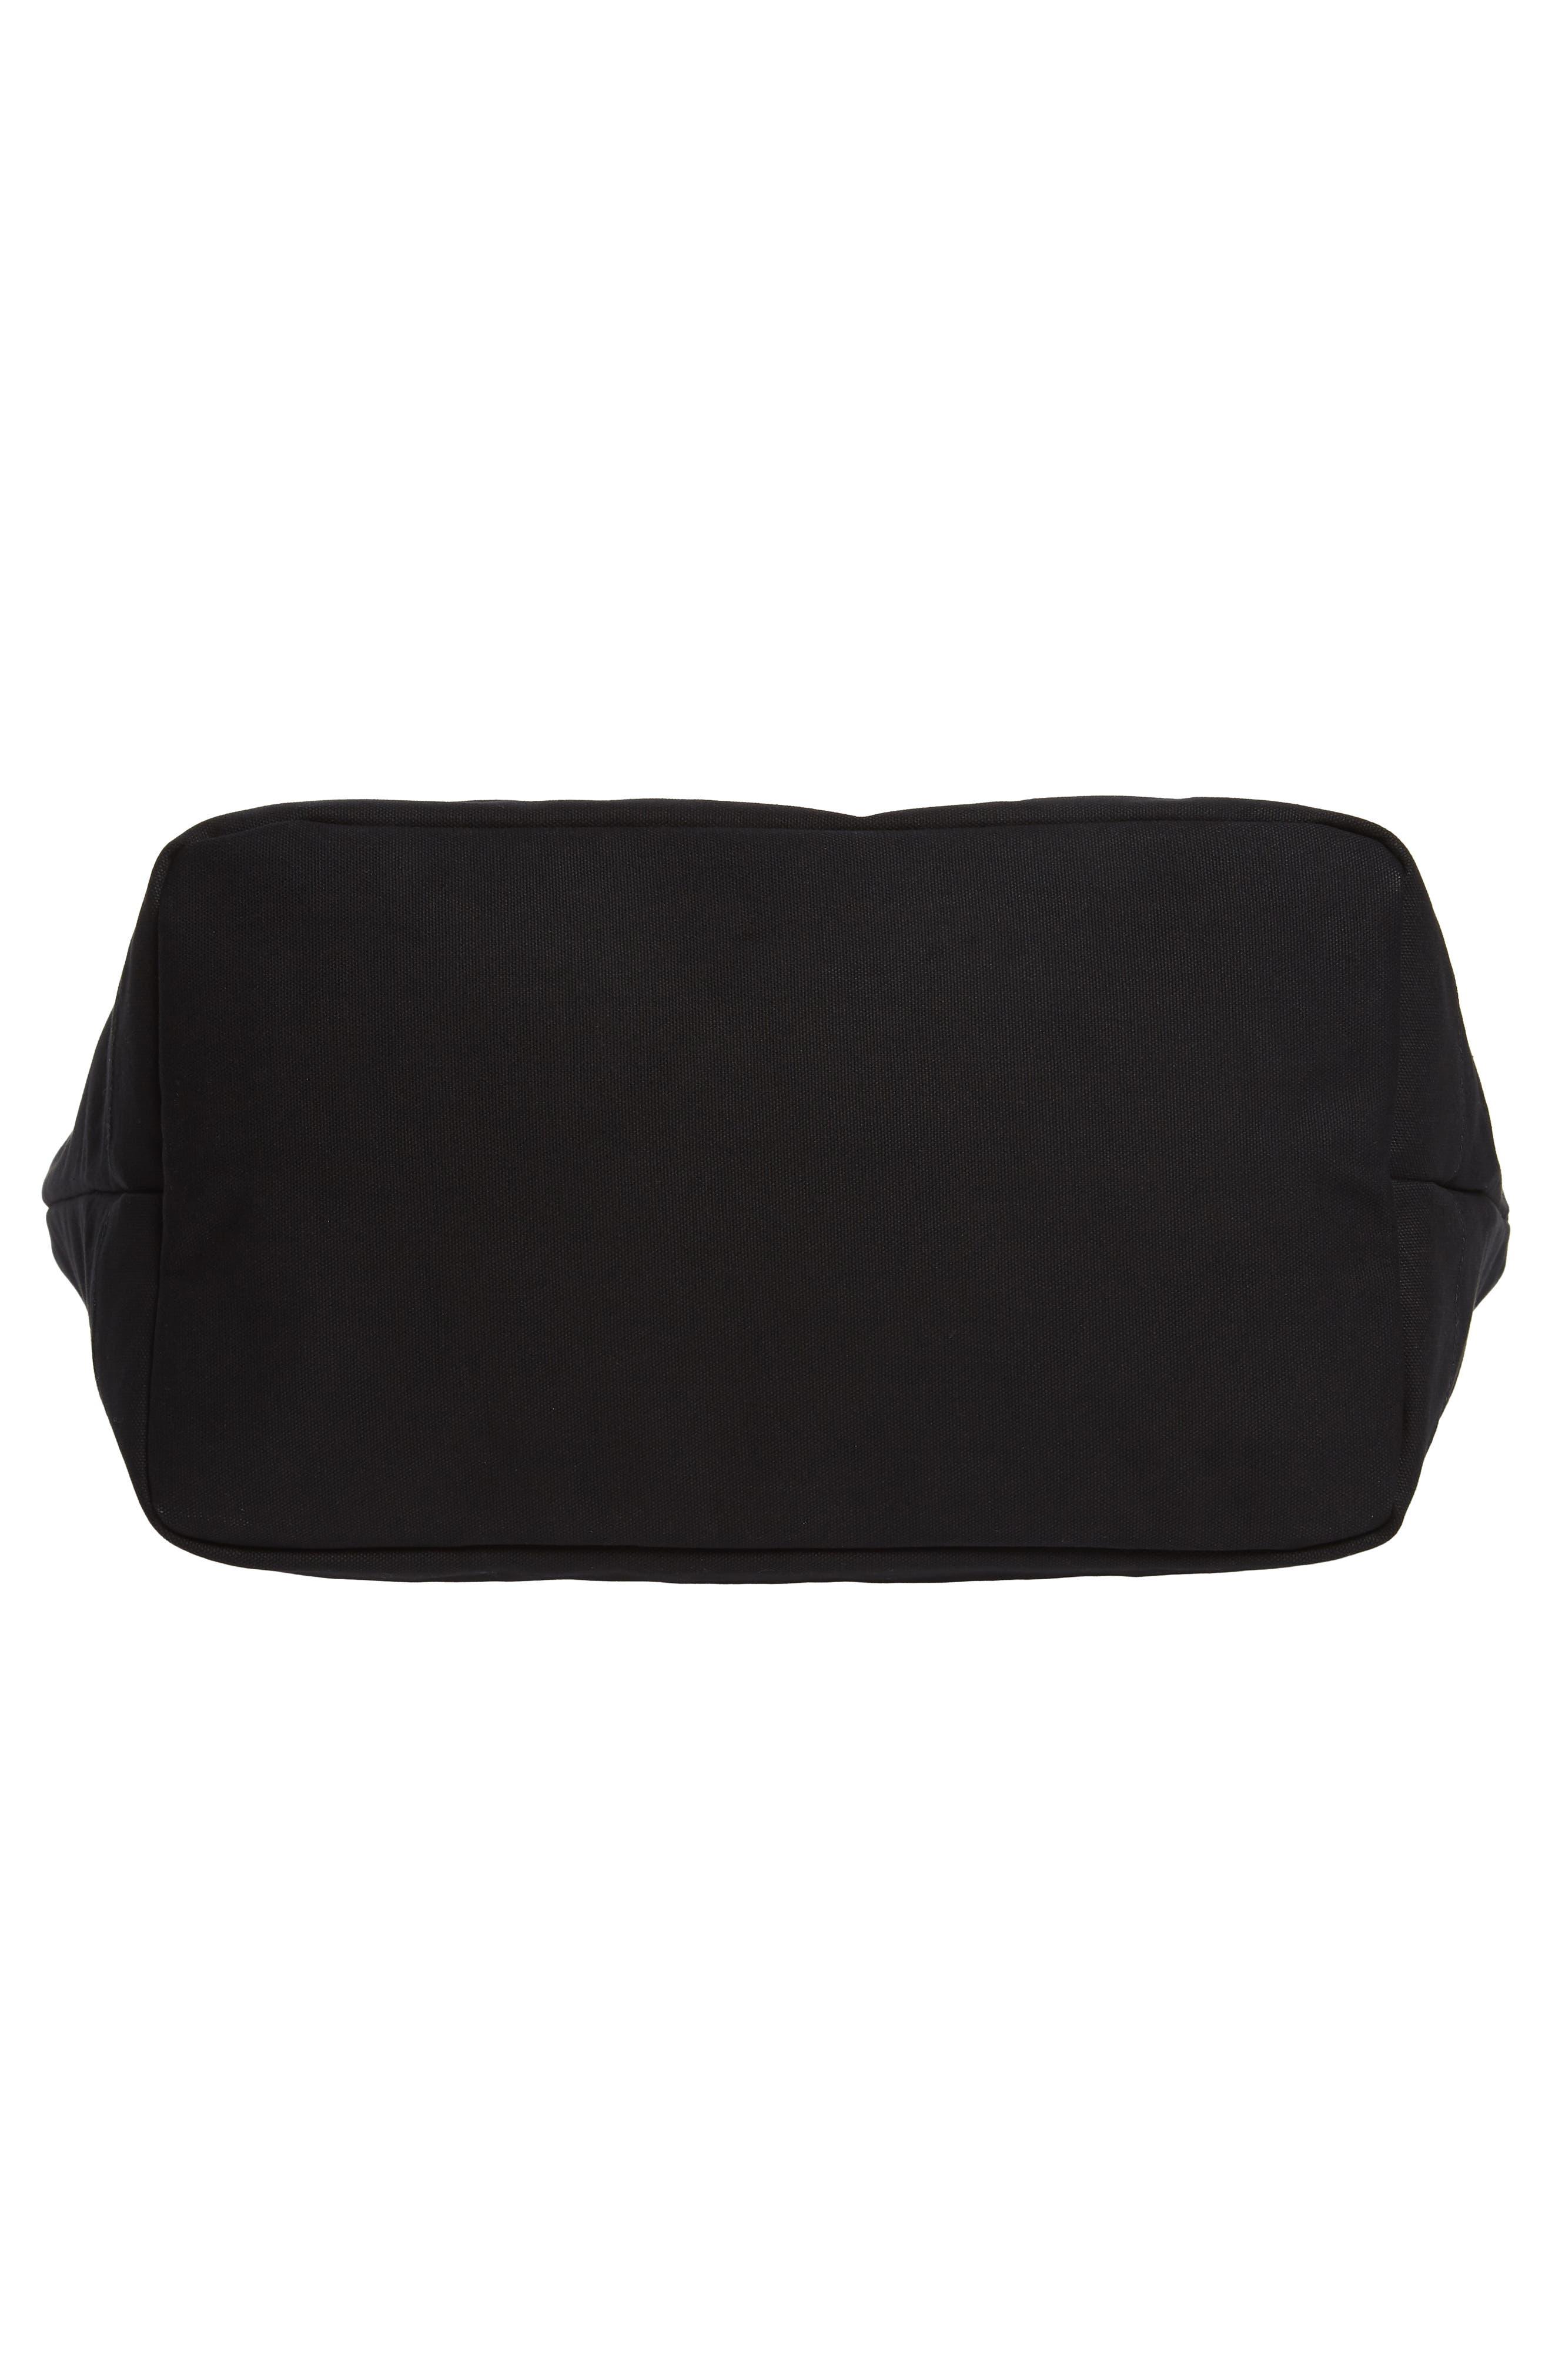 Weekend Water Repellent Tote Bag,                             Alternate thumbnail 6, color,                             Black